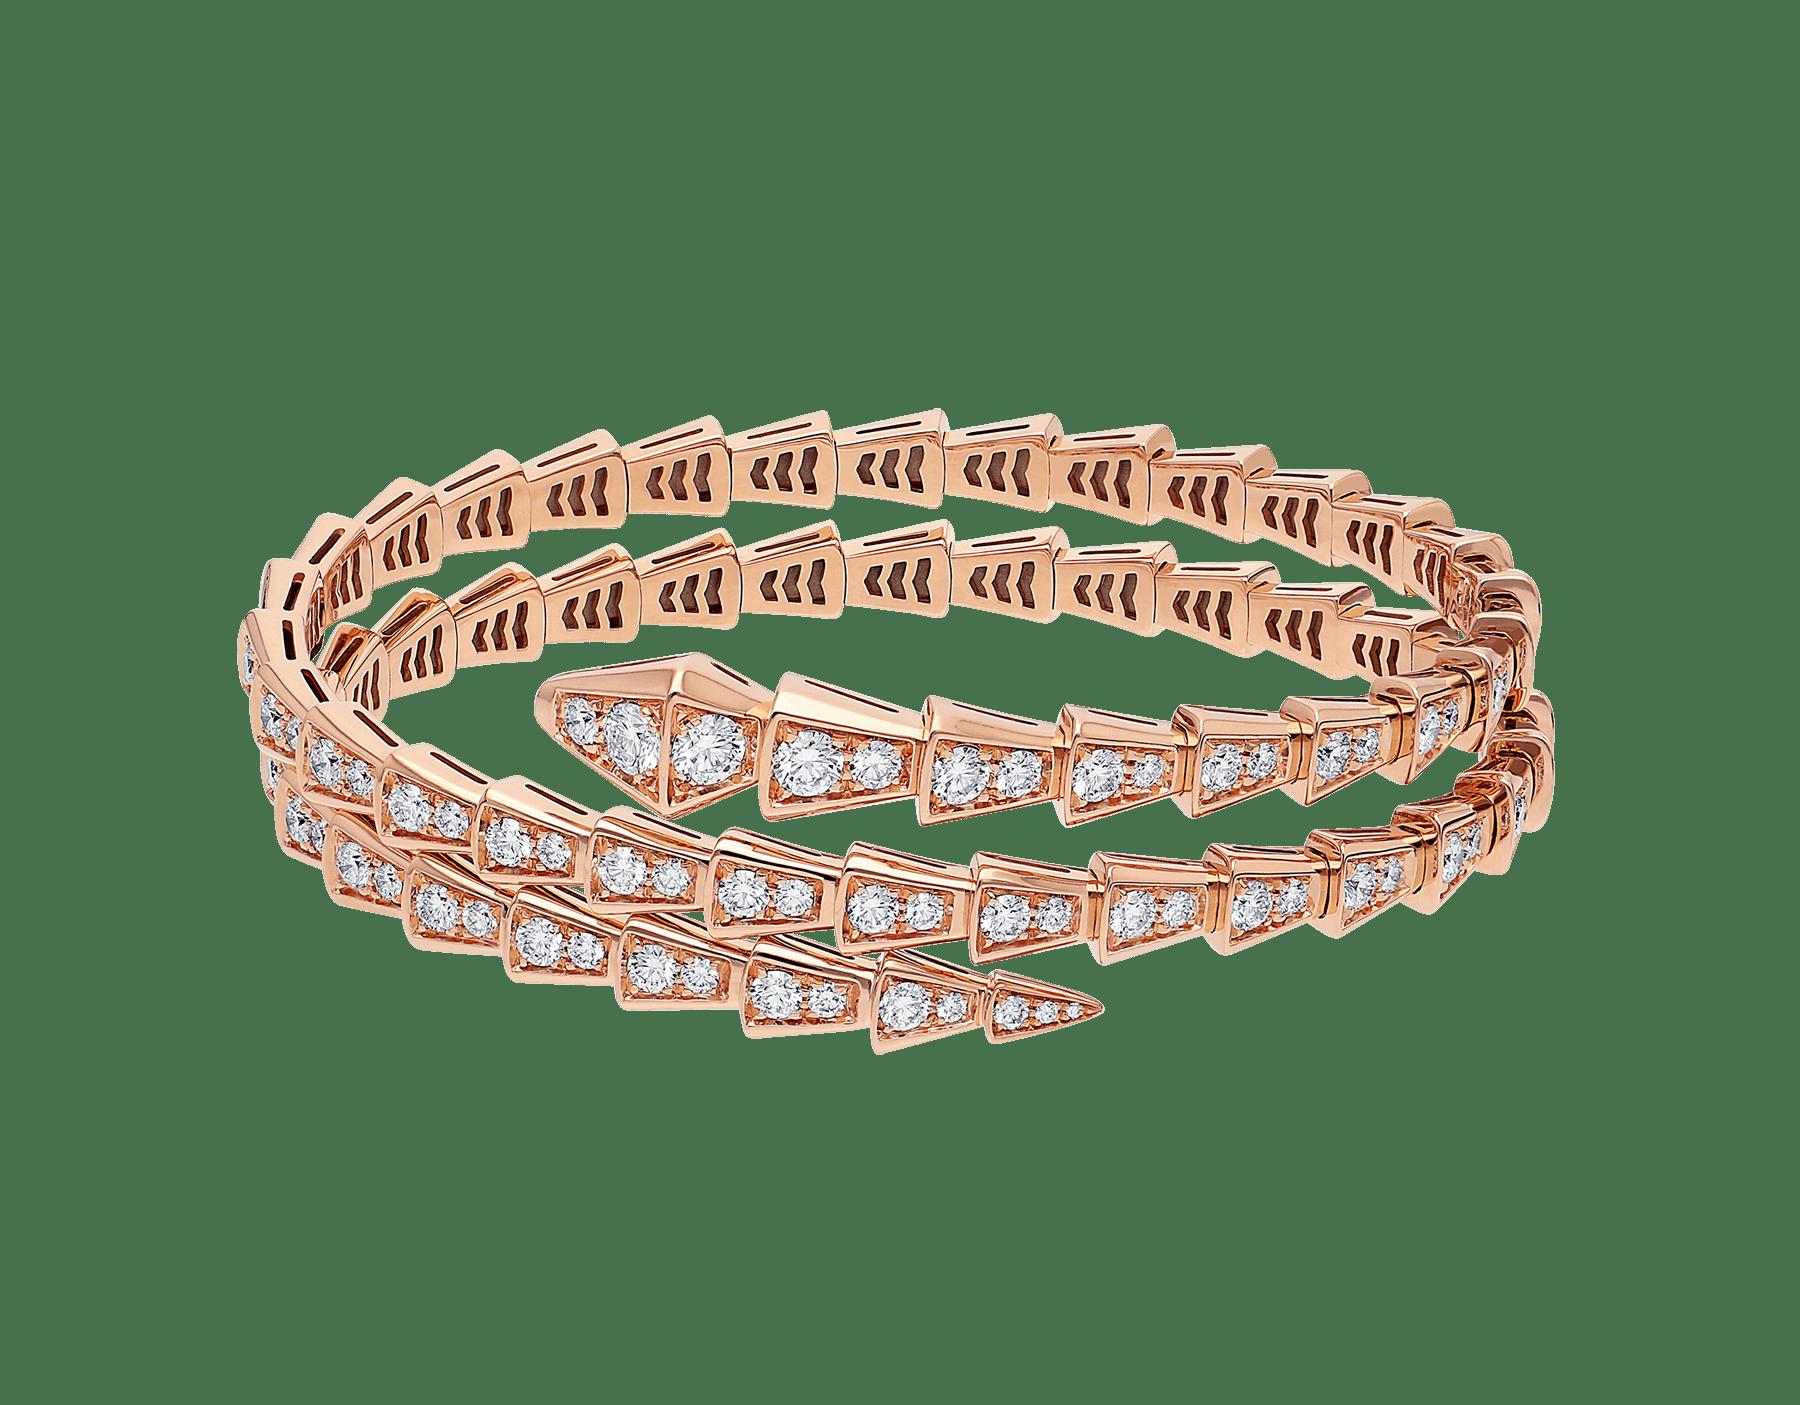 Serpenti Viper two-coil 18 kt rose gold bracelet, set with pavé diamonds BR858796 image 2